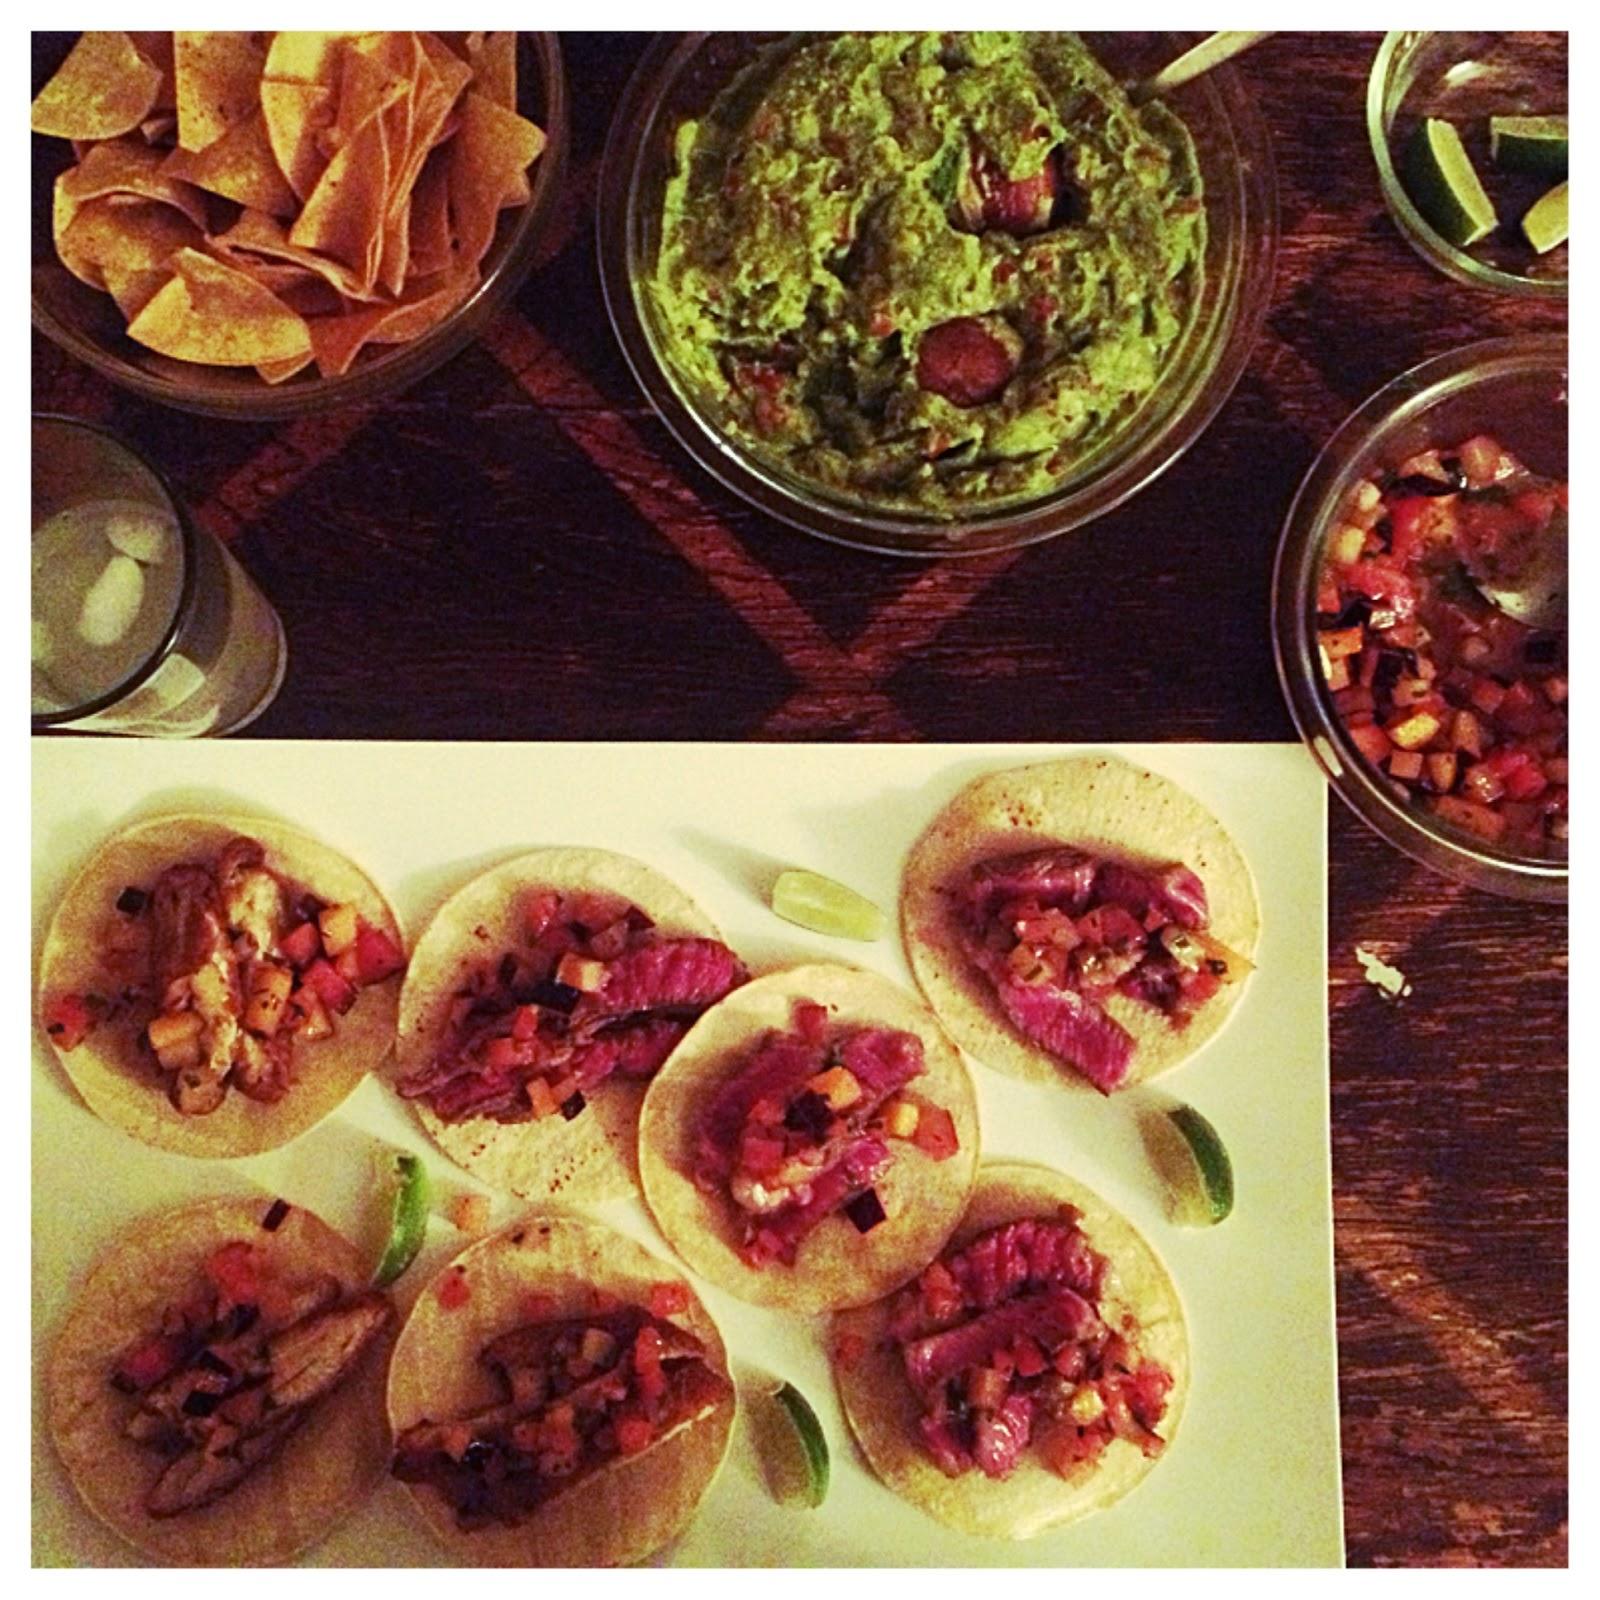 eating fabulously, tacos, fried chicken, rib eye, steak, guacamole, dinner, Christopher Stewart